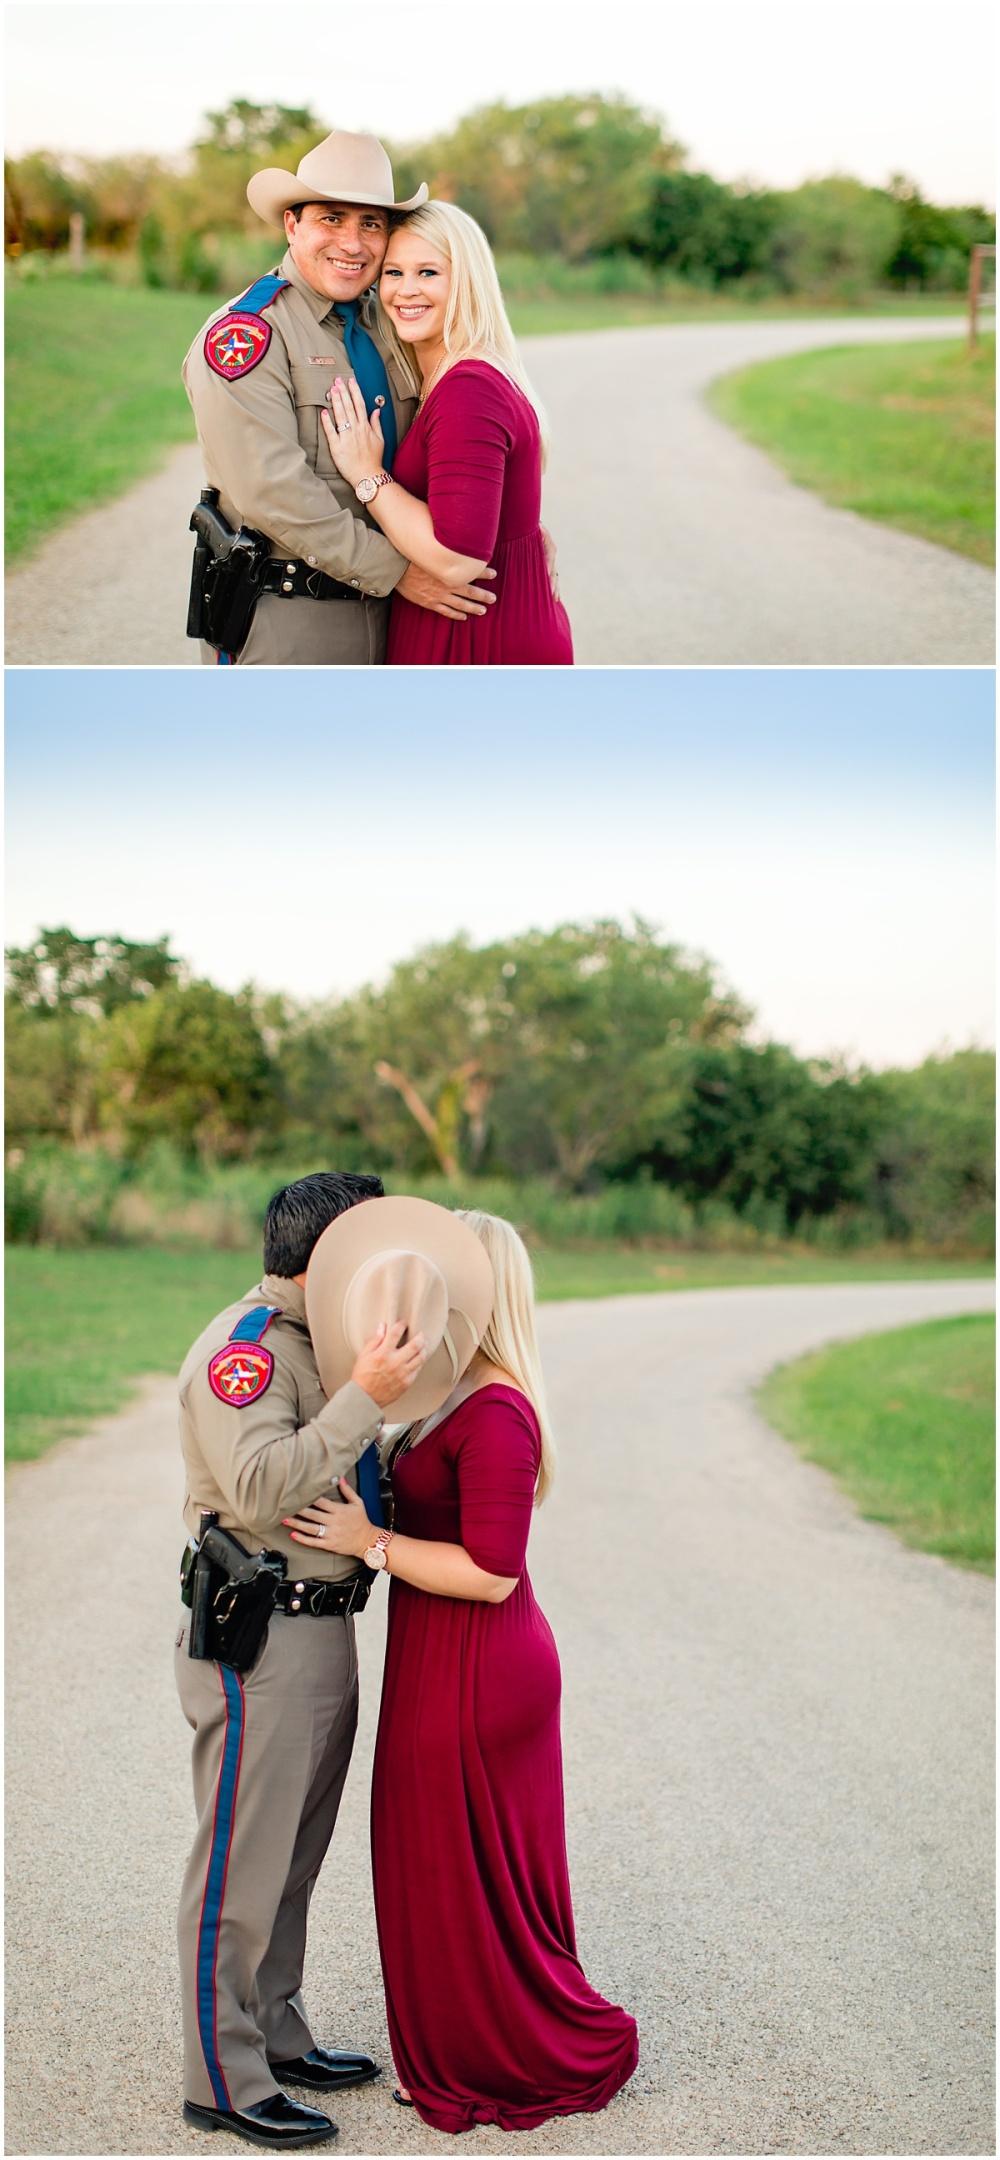 Portraits-State-Trooper-Photos-San-Antonio-Hill-Country-Texas-Carly-Barton-Photography_0006.jpg